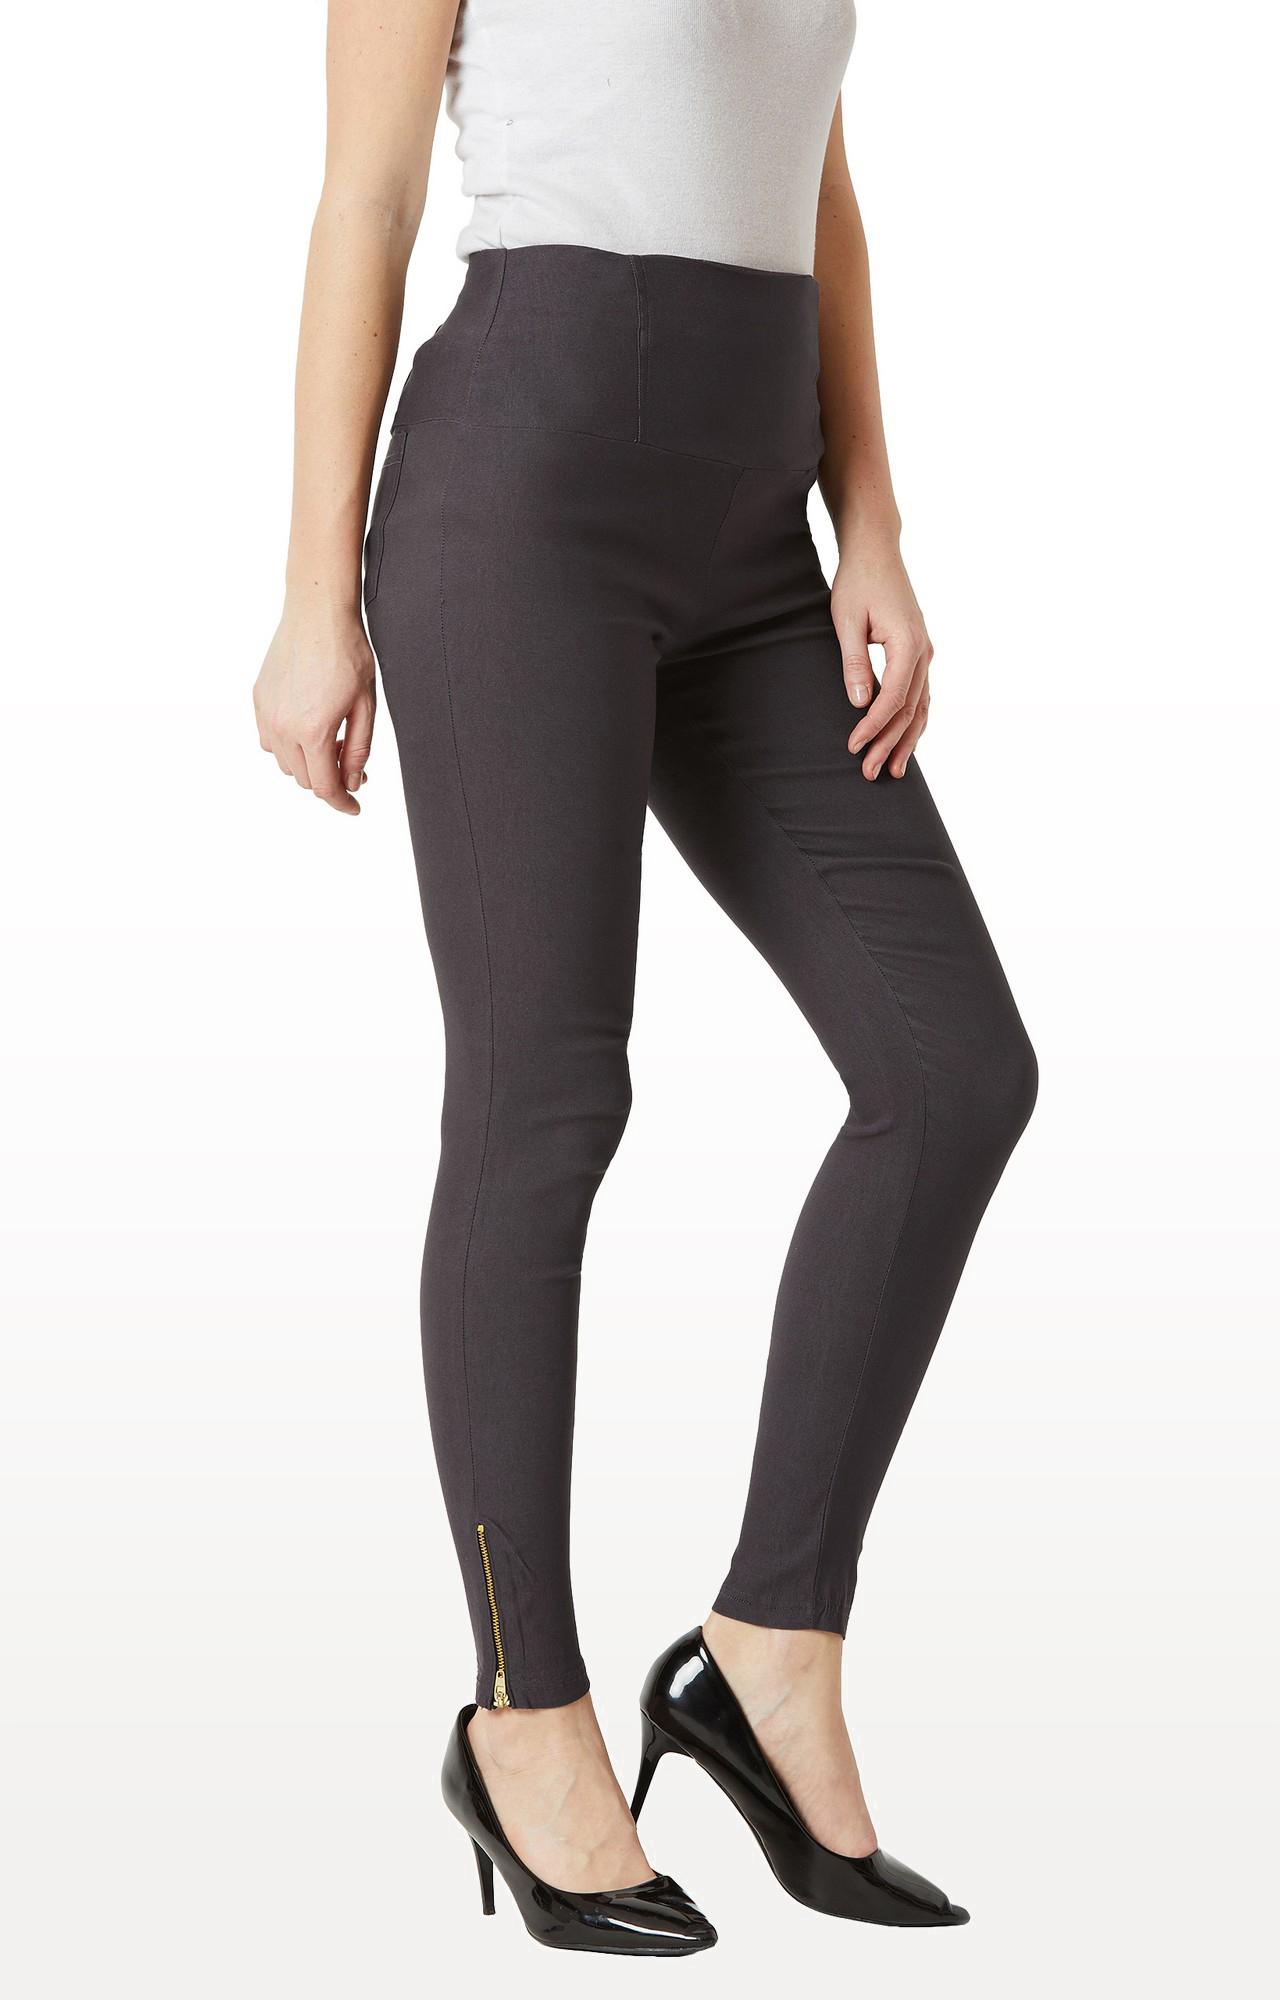 MISS CHASE | Dark Grey Solid High Waist Patch Pocket Zipper Detailing Regular Length Jeggings